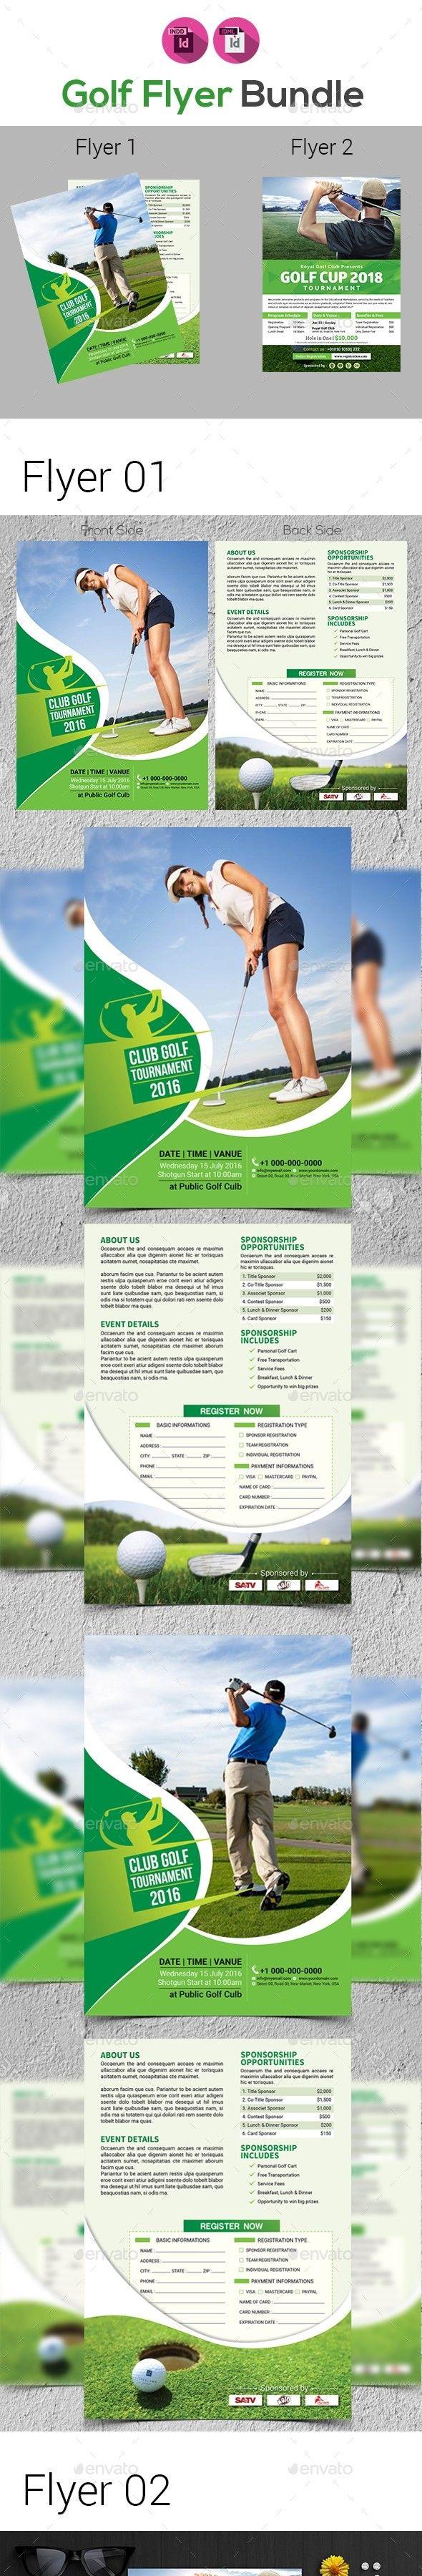 advertising bundle flyer template business course cup elegant